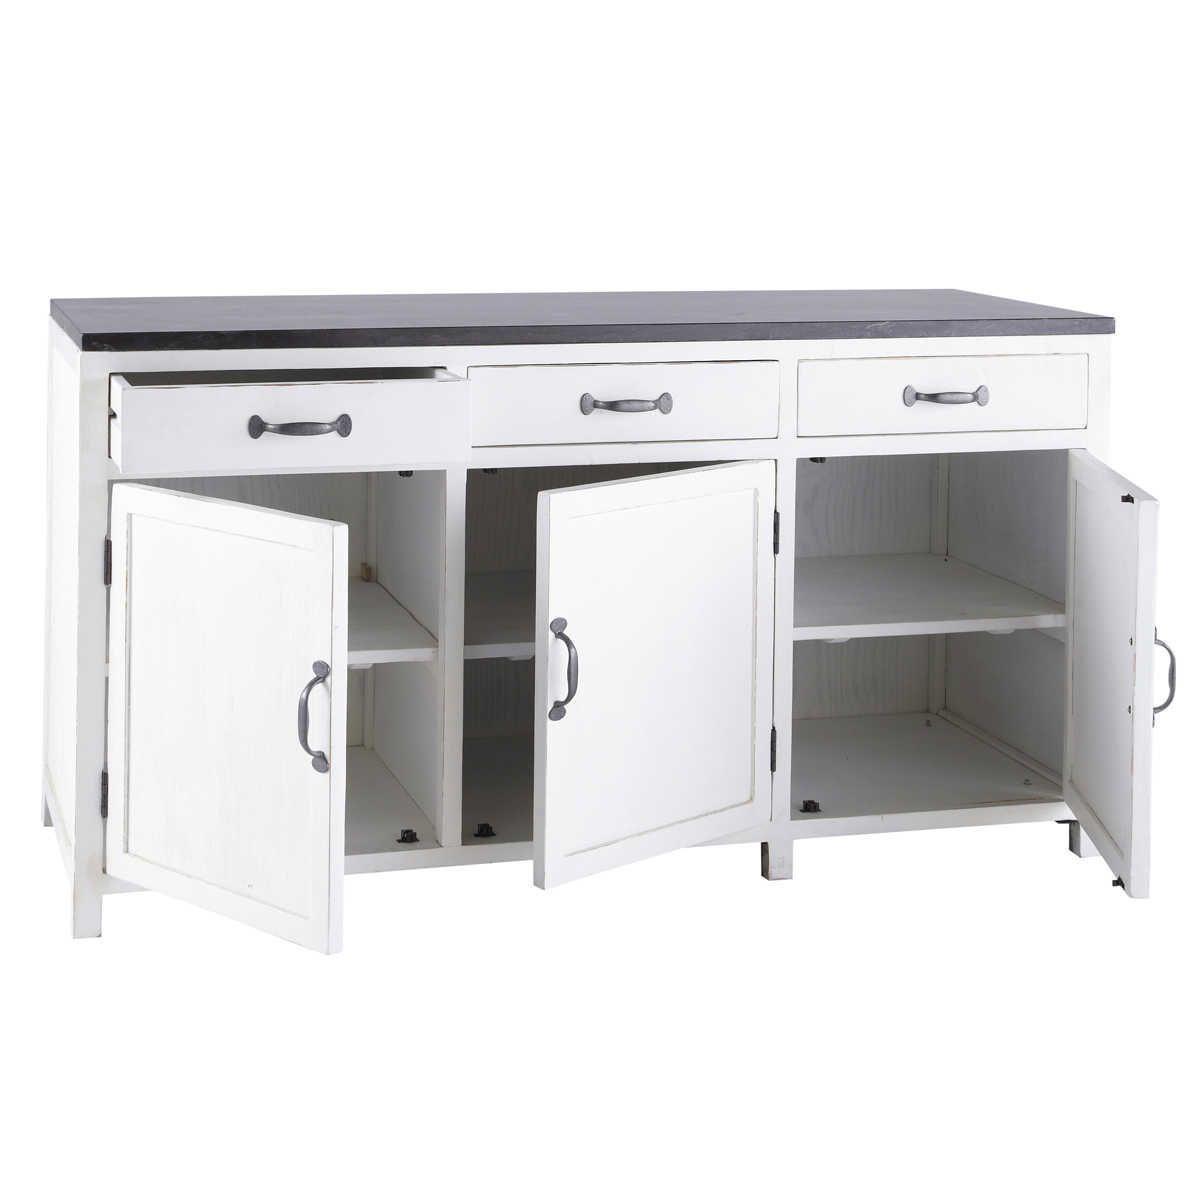 hauteur meuble bas cuisine ikea ikea meuble cuisine bas 3 portes ... - Meubles Bas De Cuisine